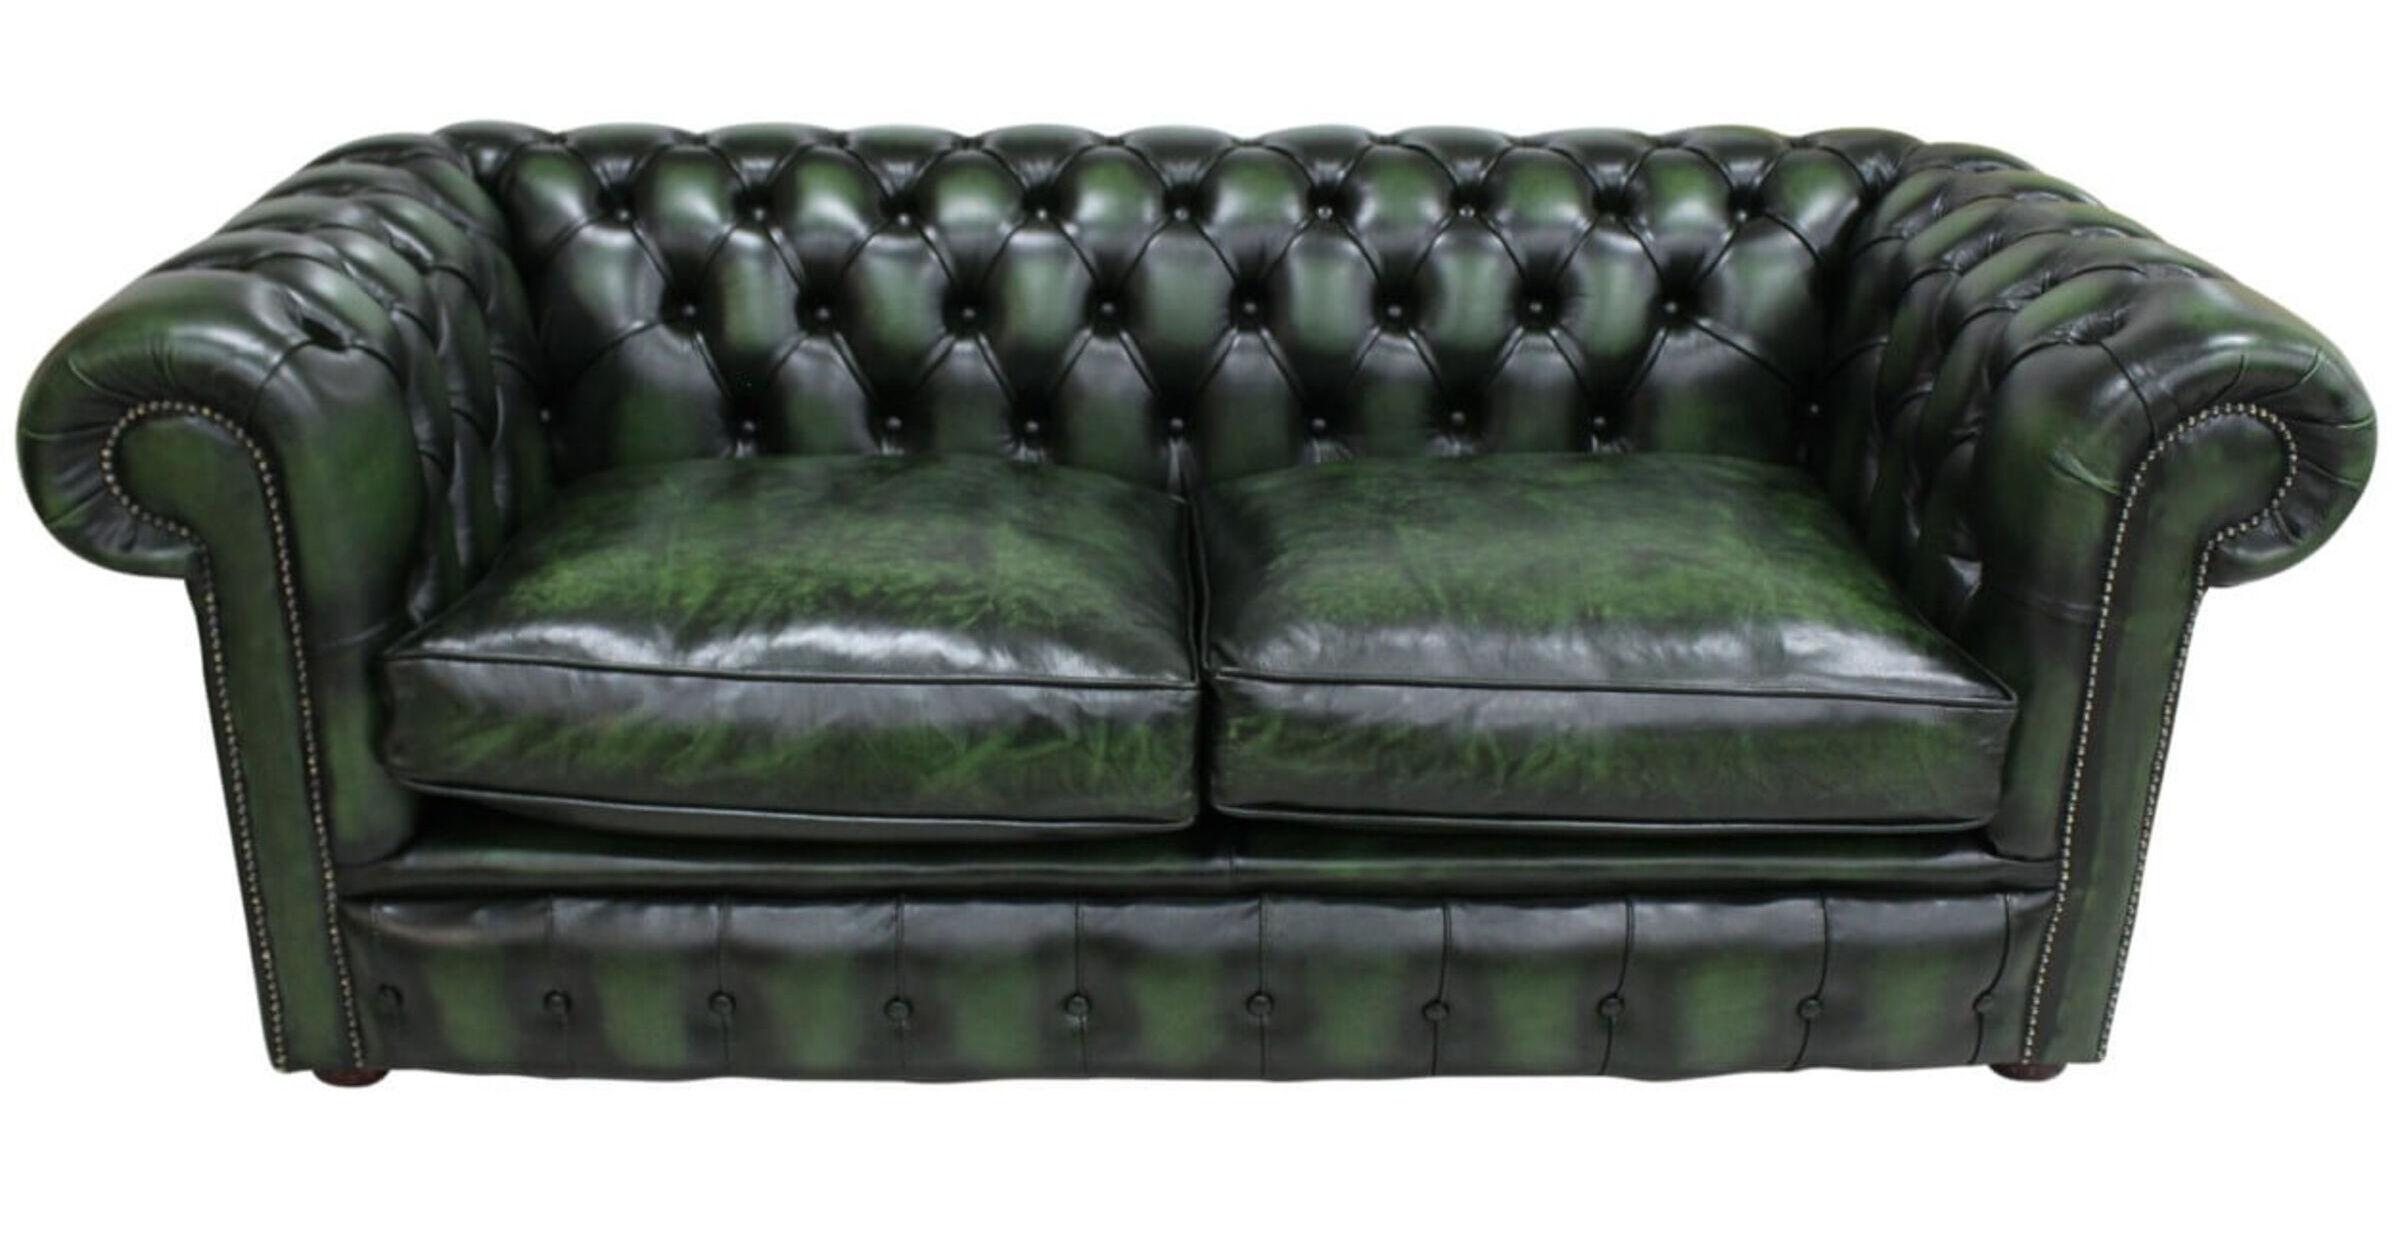 Leather Chaise Lounge Sofa